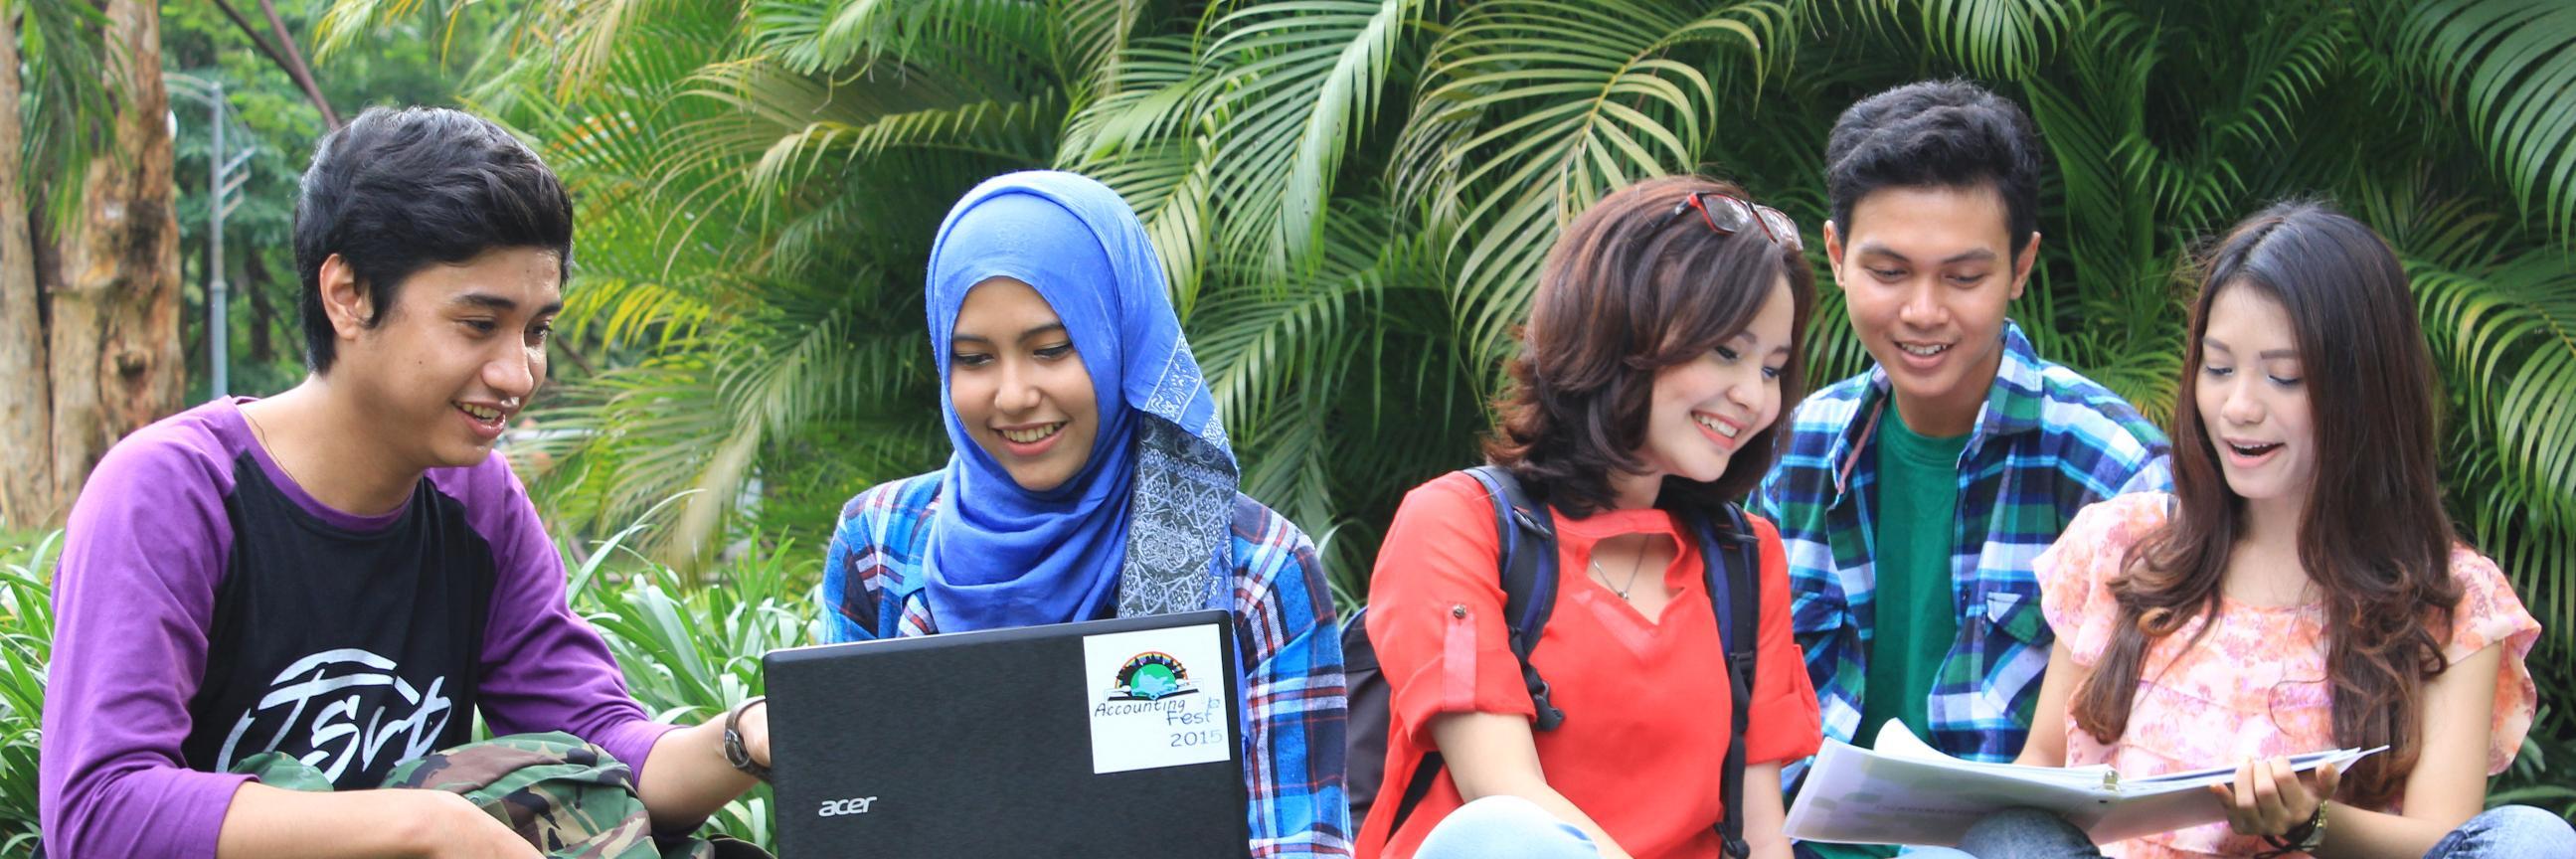 Universitas Sahid's official Twitter account